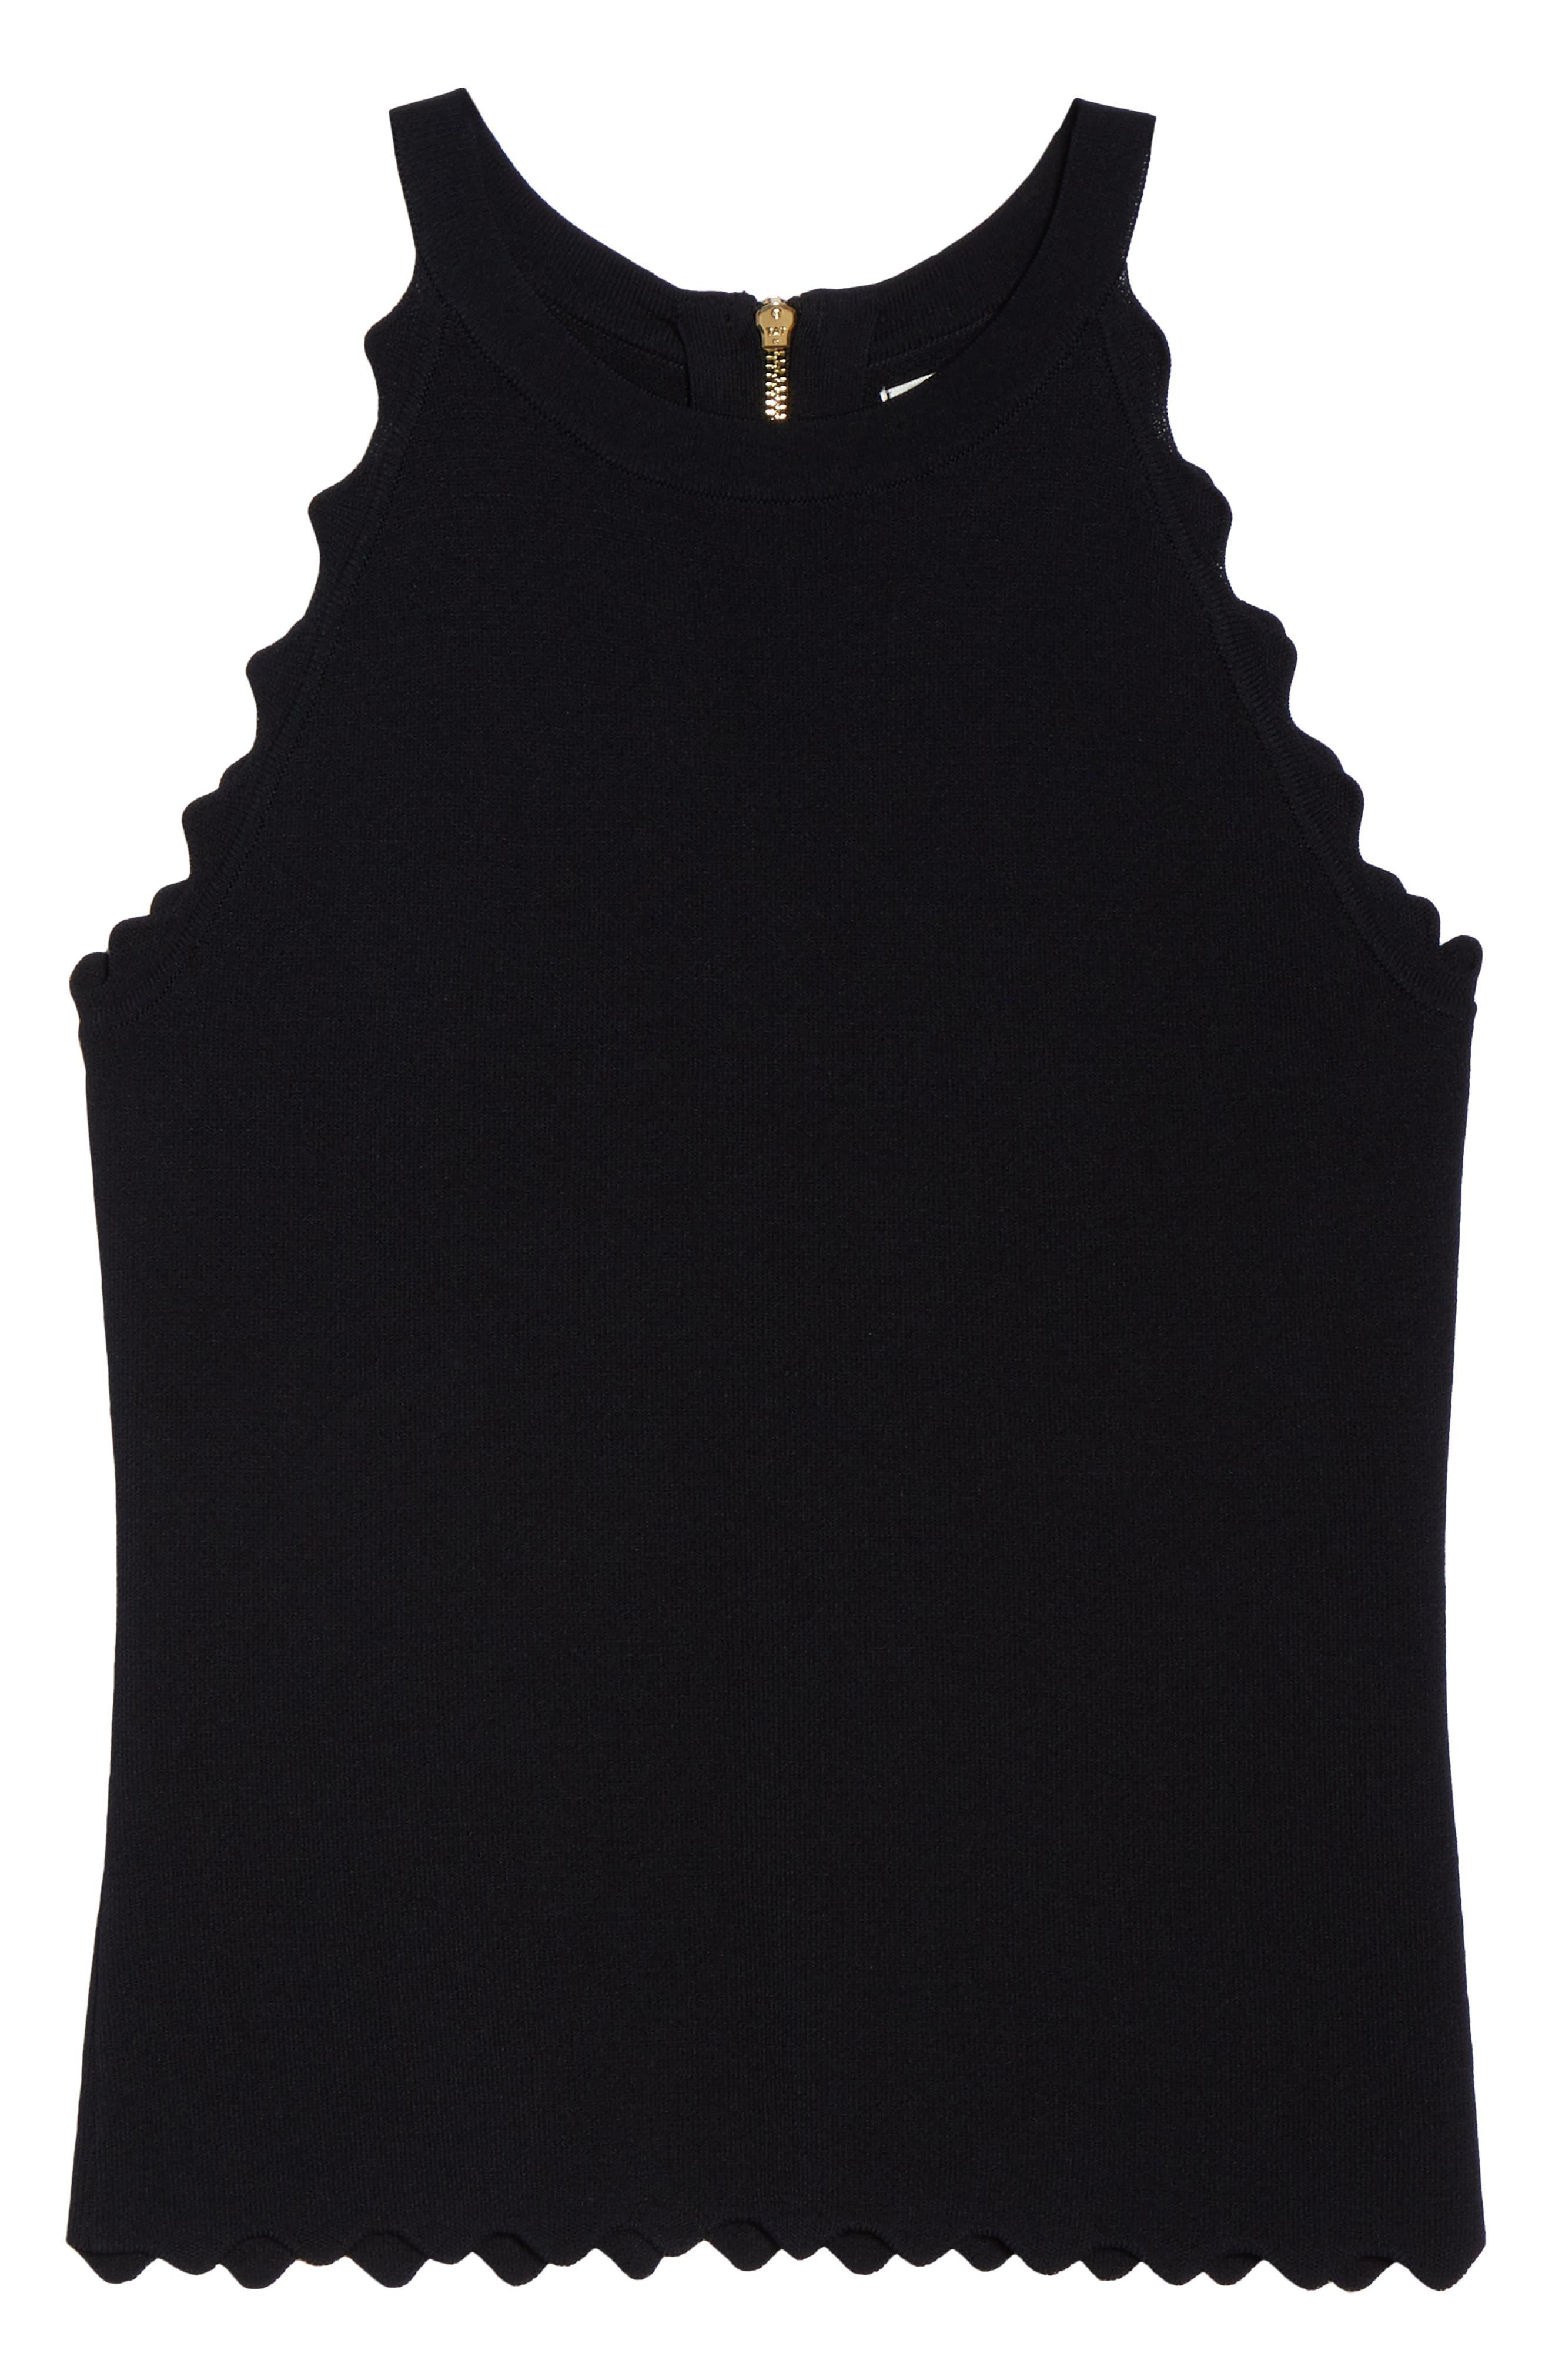 Scallop Knit Halter Top,                             Alternate thumbnail 6, color,                             Black